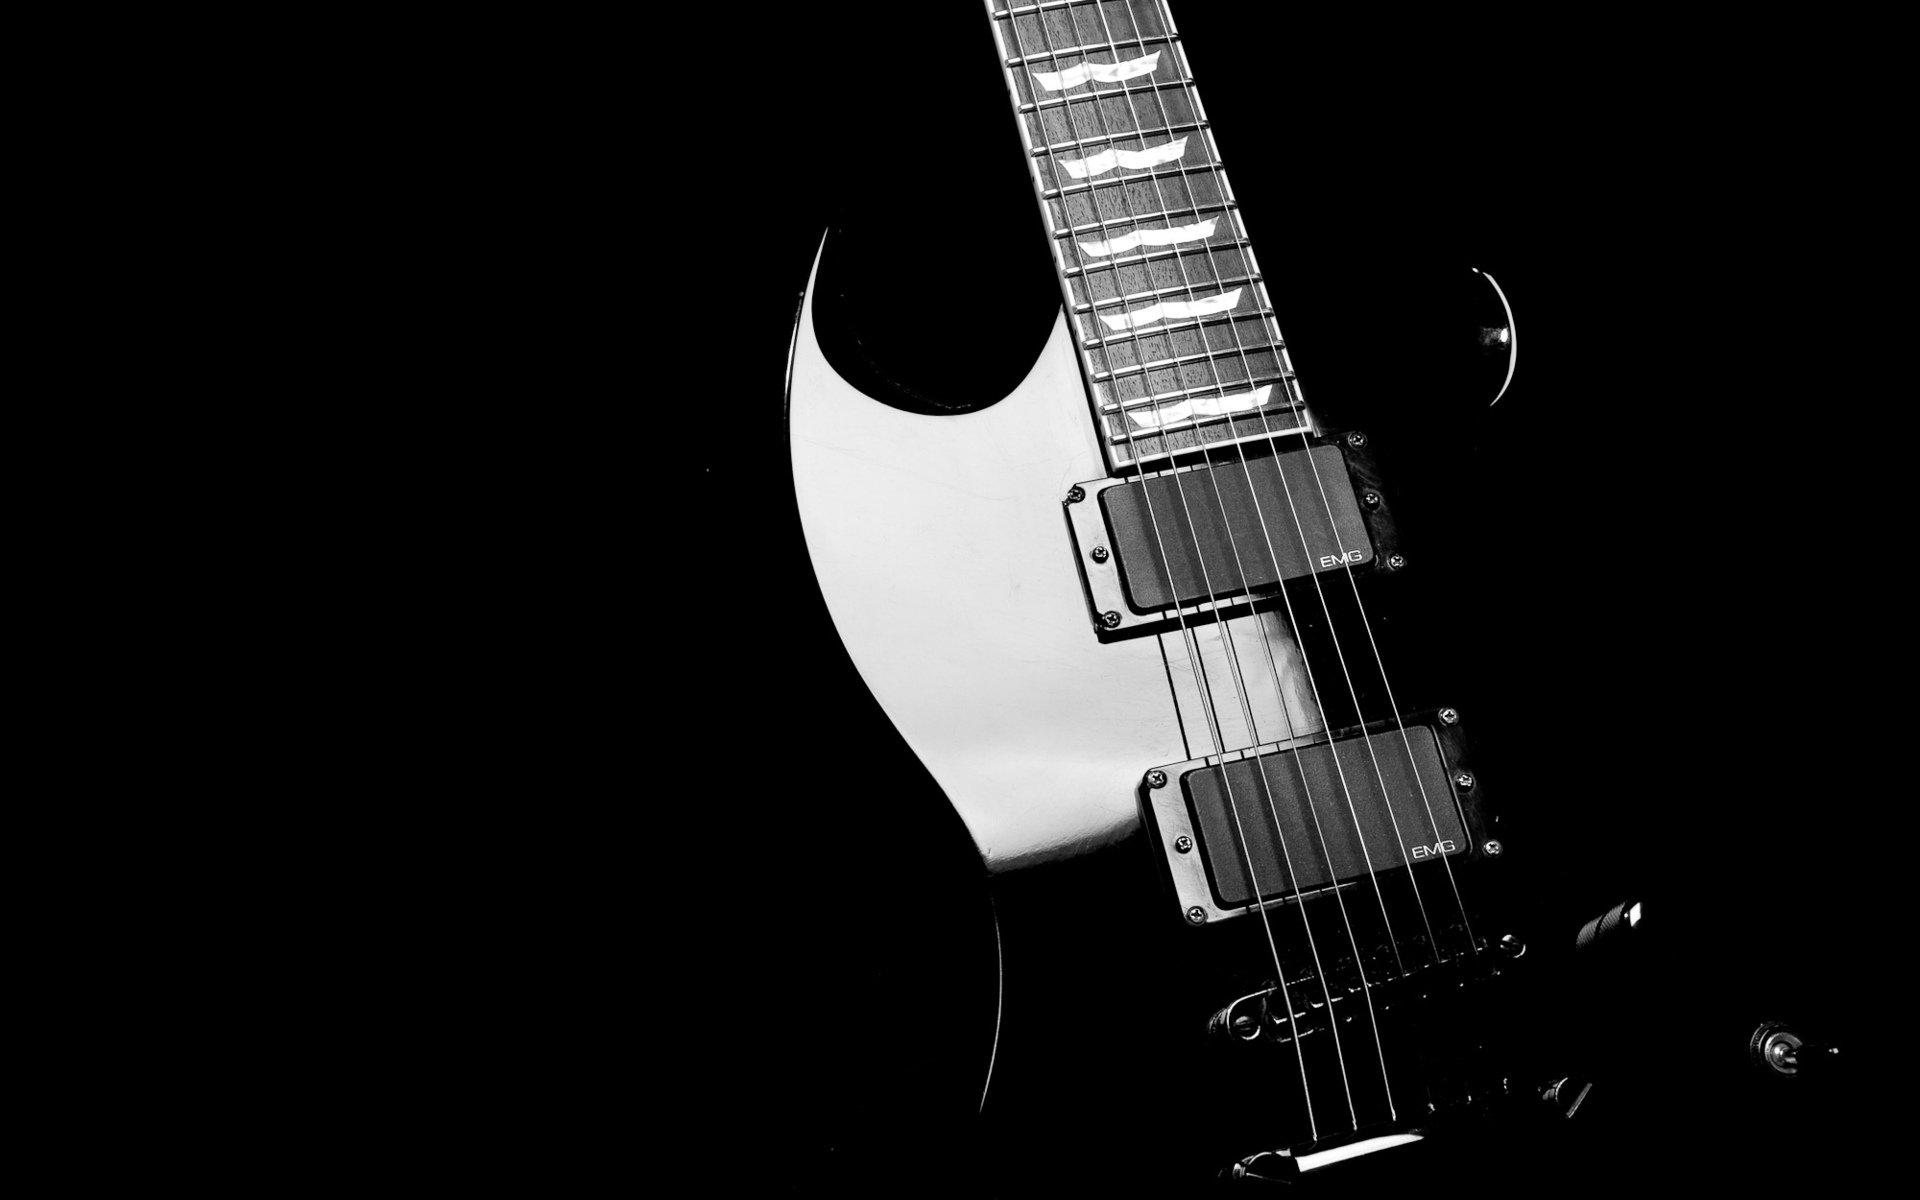 Hd wallpaper guitar - Hd Wallpaper Background Id 362914 1920x1200 Music Guitar